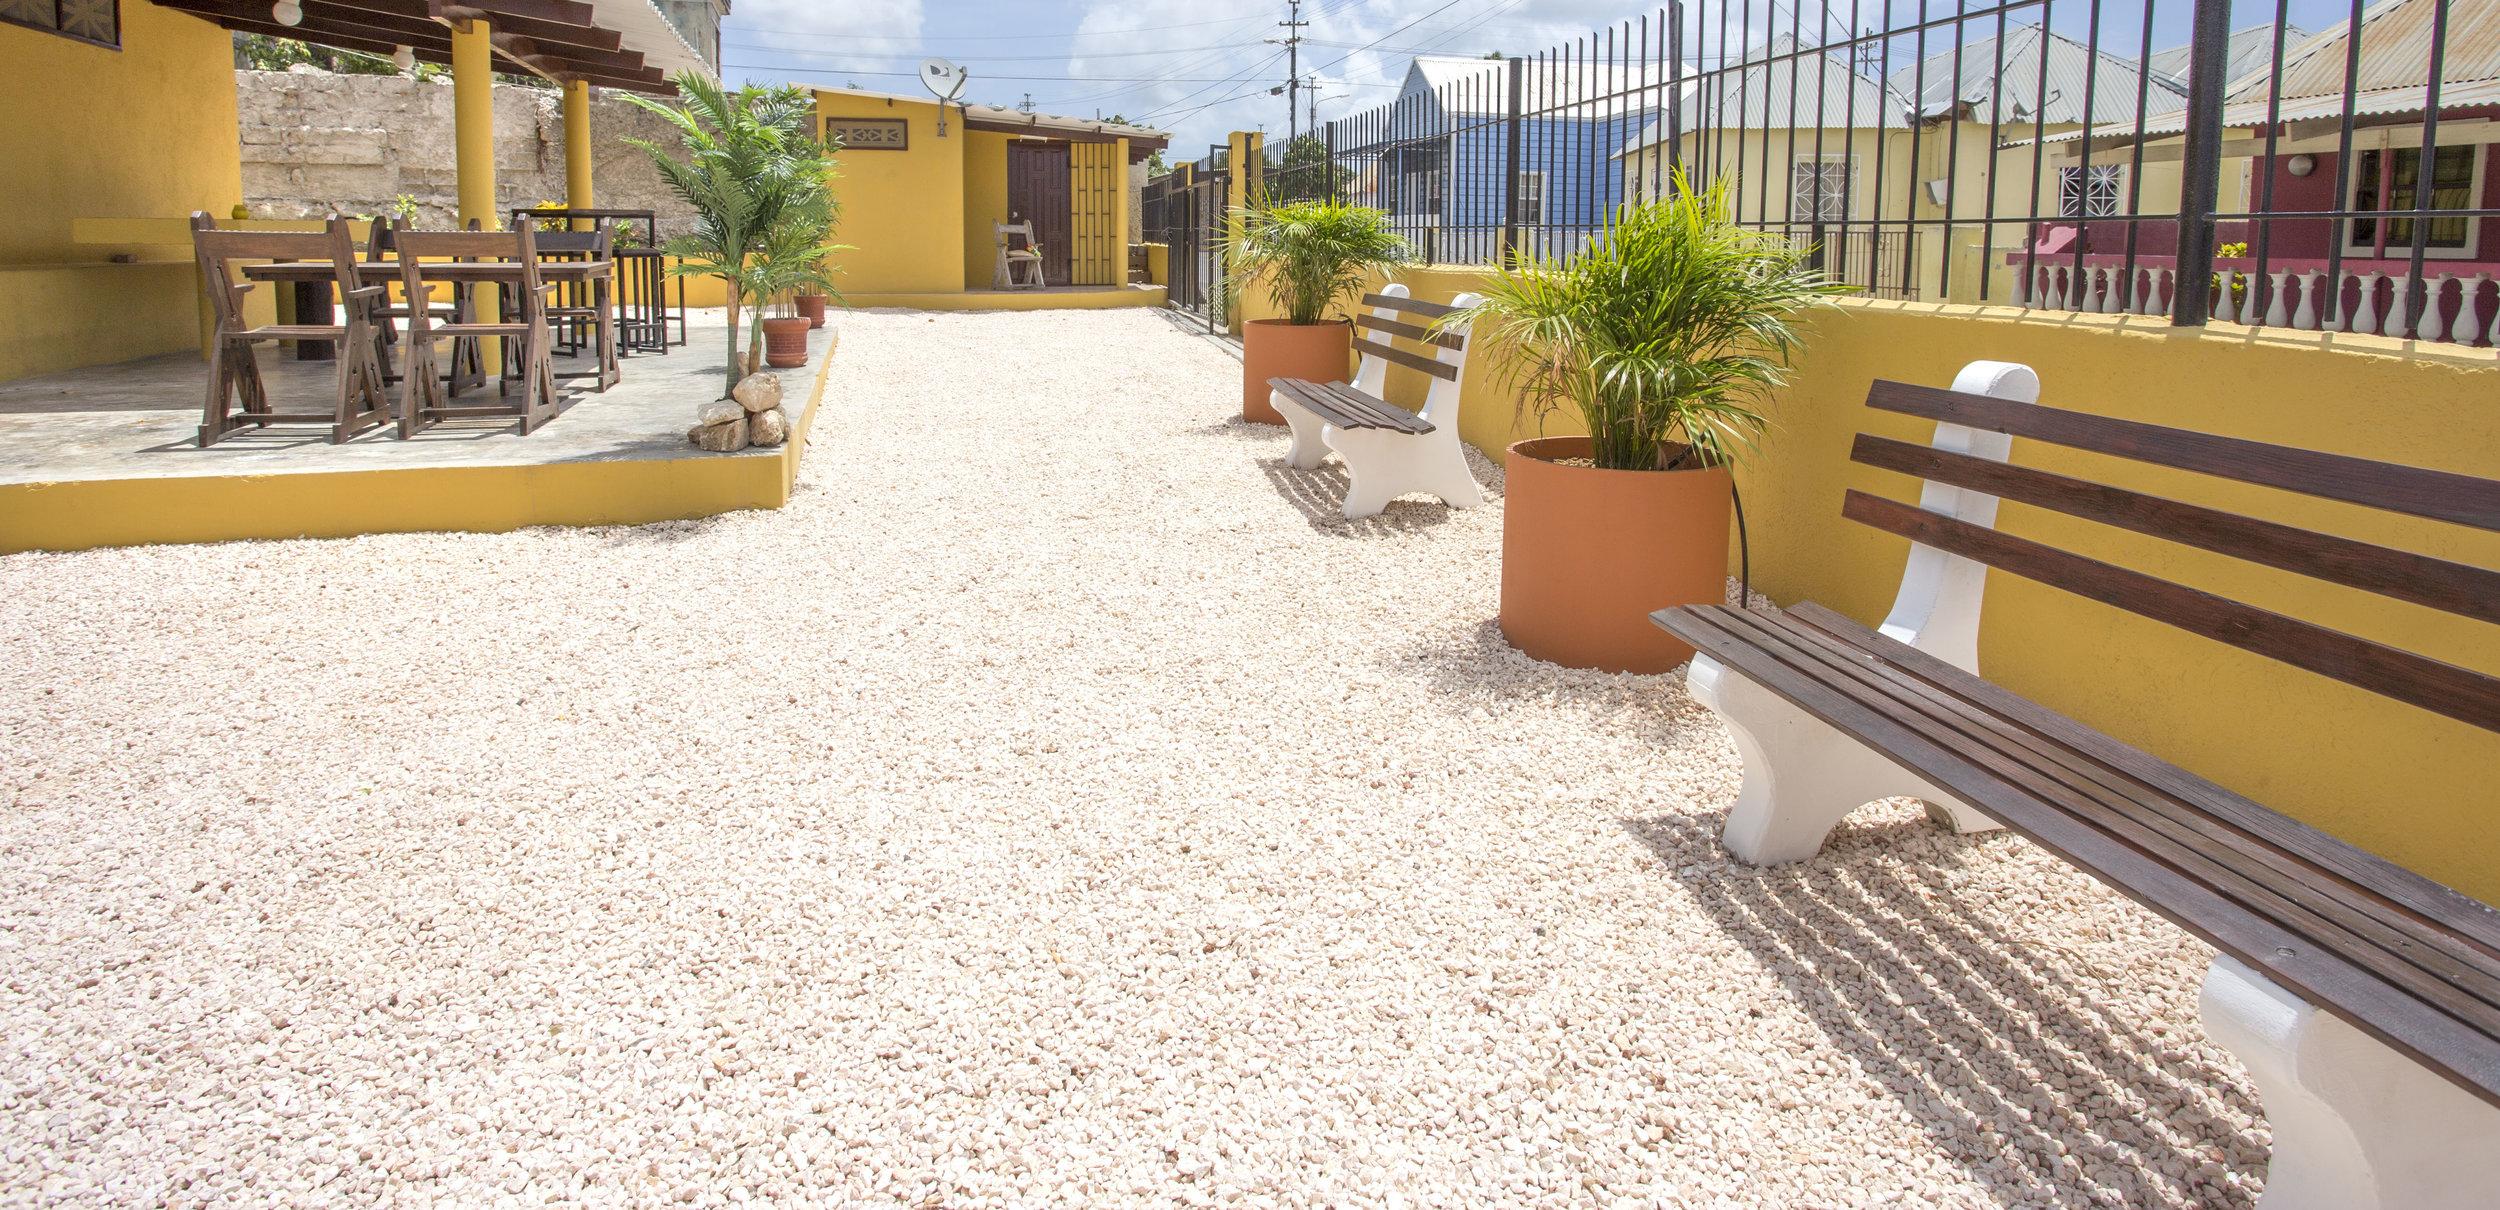 StageDesk-Curaçao-Stagehuis-BergAltena-Pelikaan-huis01.jpg